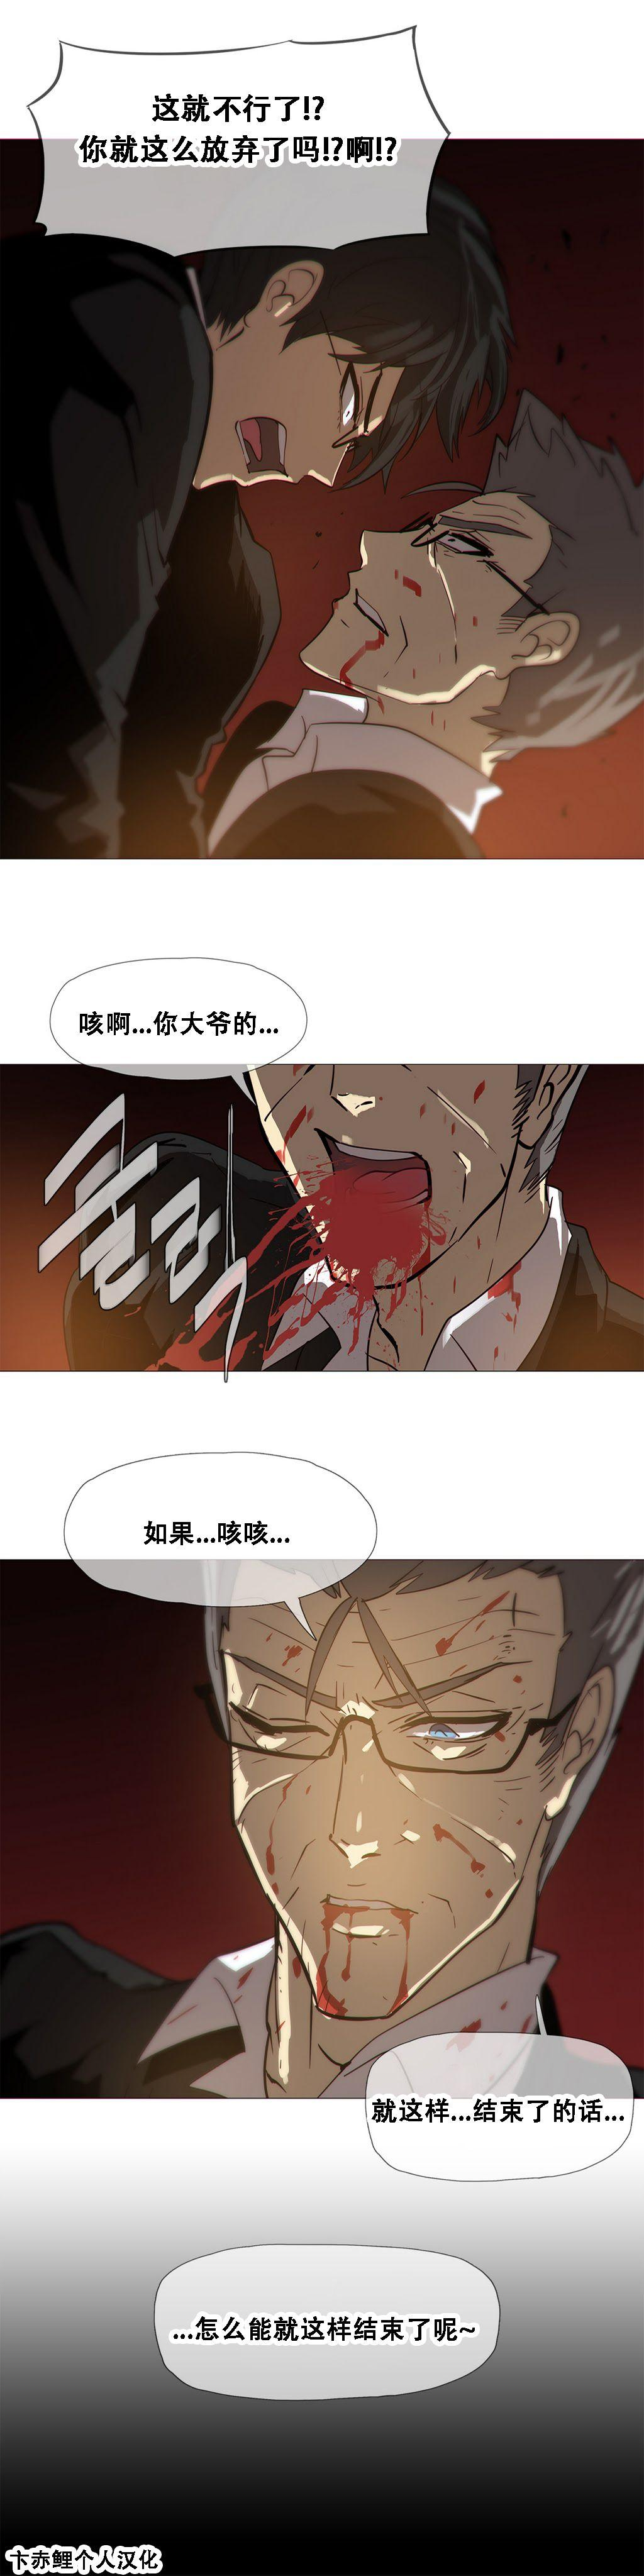 HouseHold Affairs 【卞赤鲤个人汉化】1~33话(持续更新中) 386